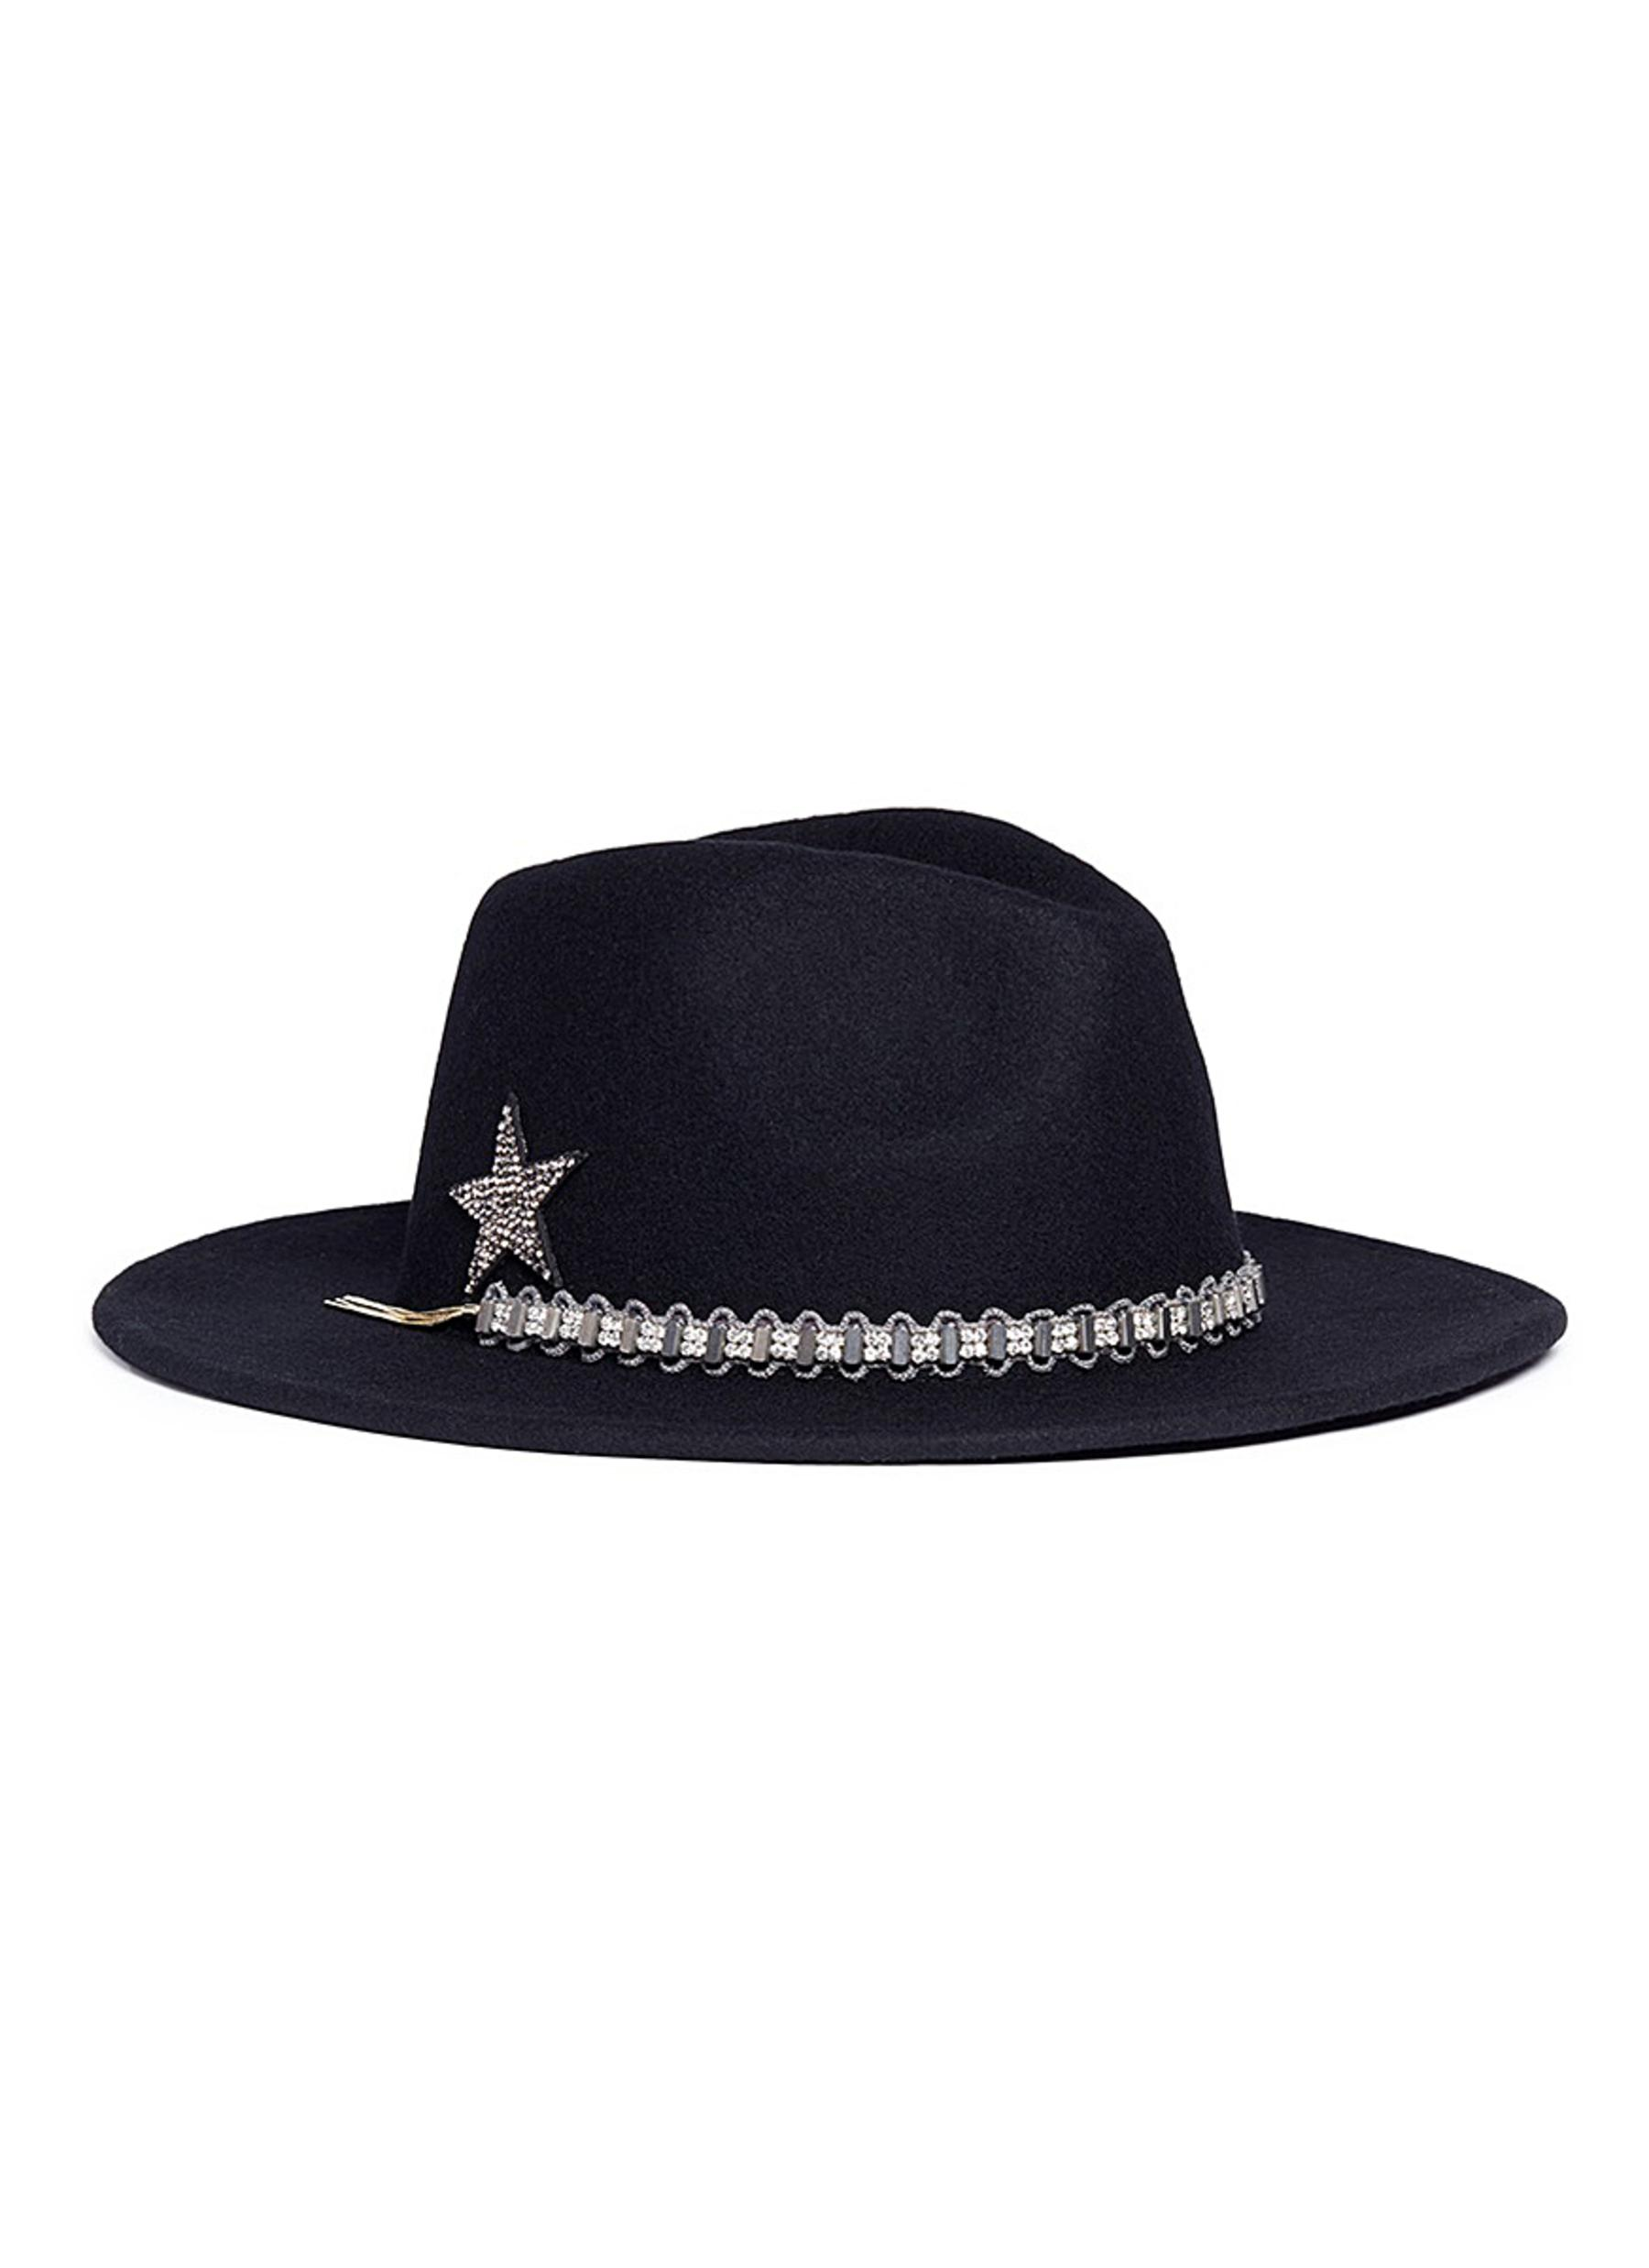 VENNA Jewelled Band Wool Felt Fedora Hat